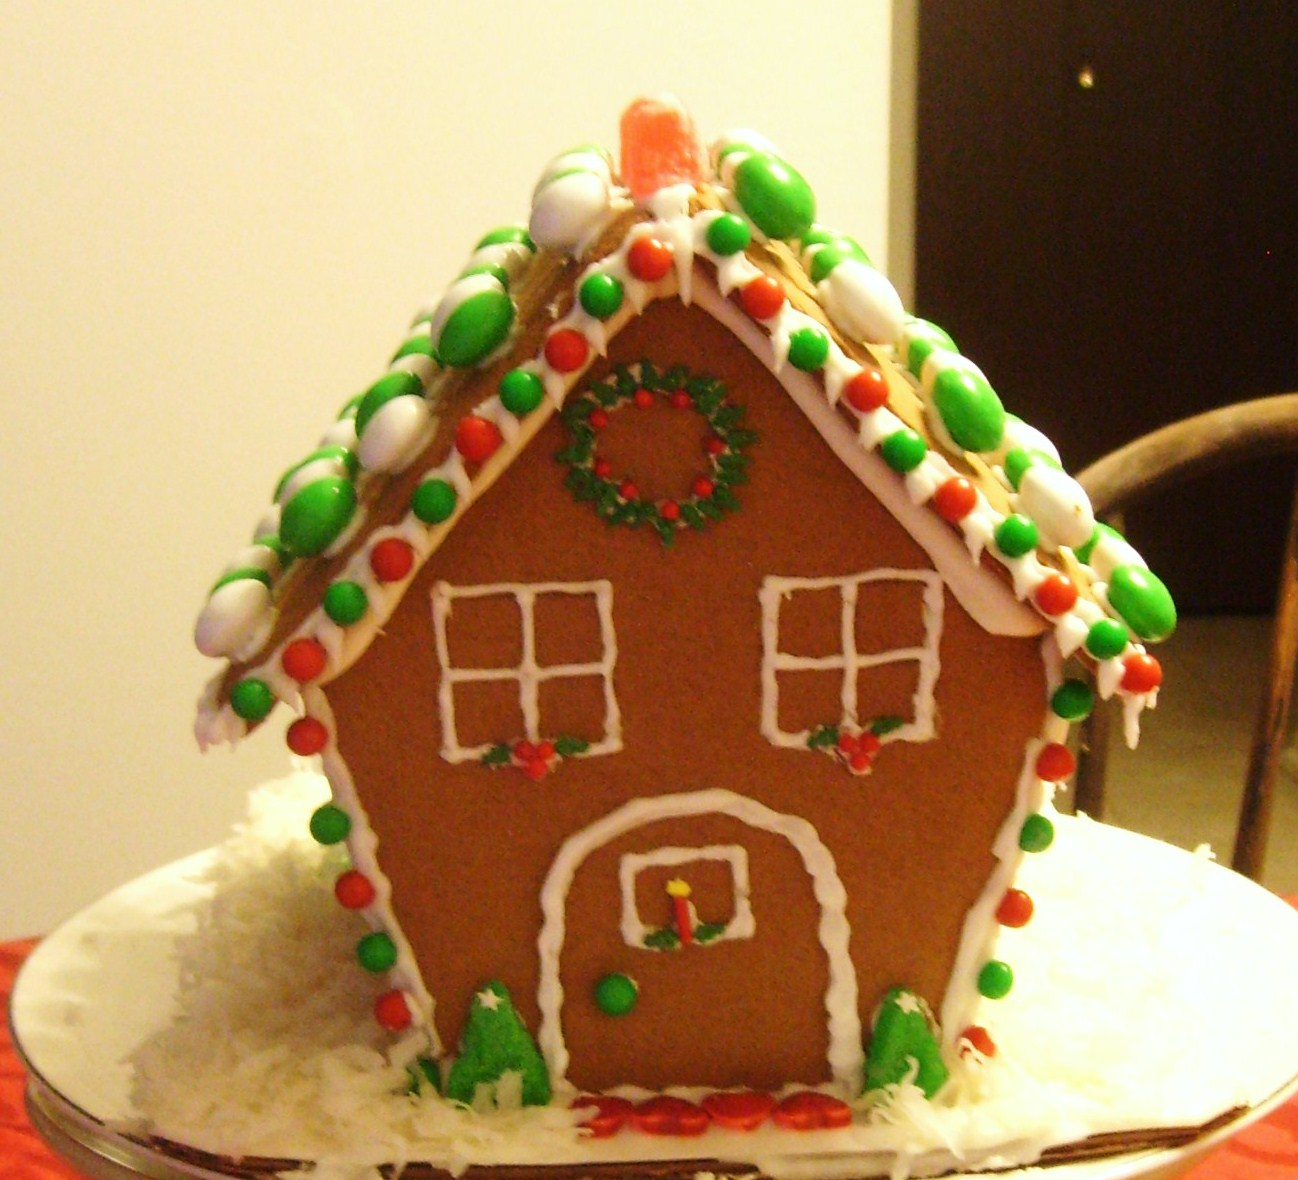 Simple Savory Satisfying Gingerbread House Decoration Ideas & Easy Gingerbread House Decorating Ideas - Elitflat